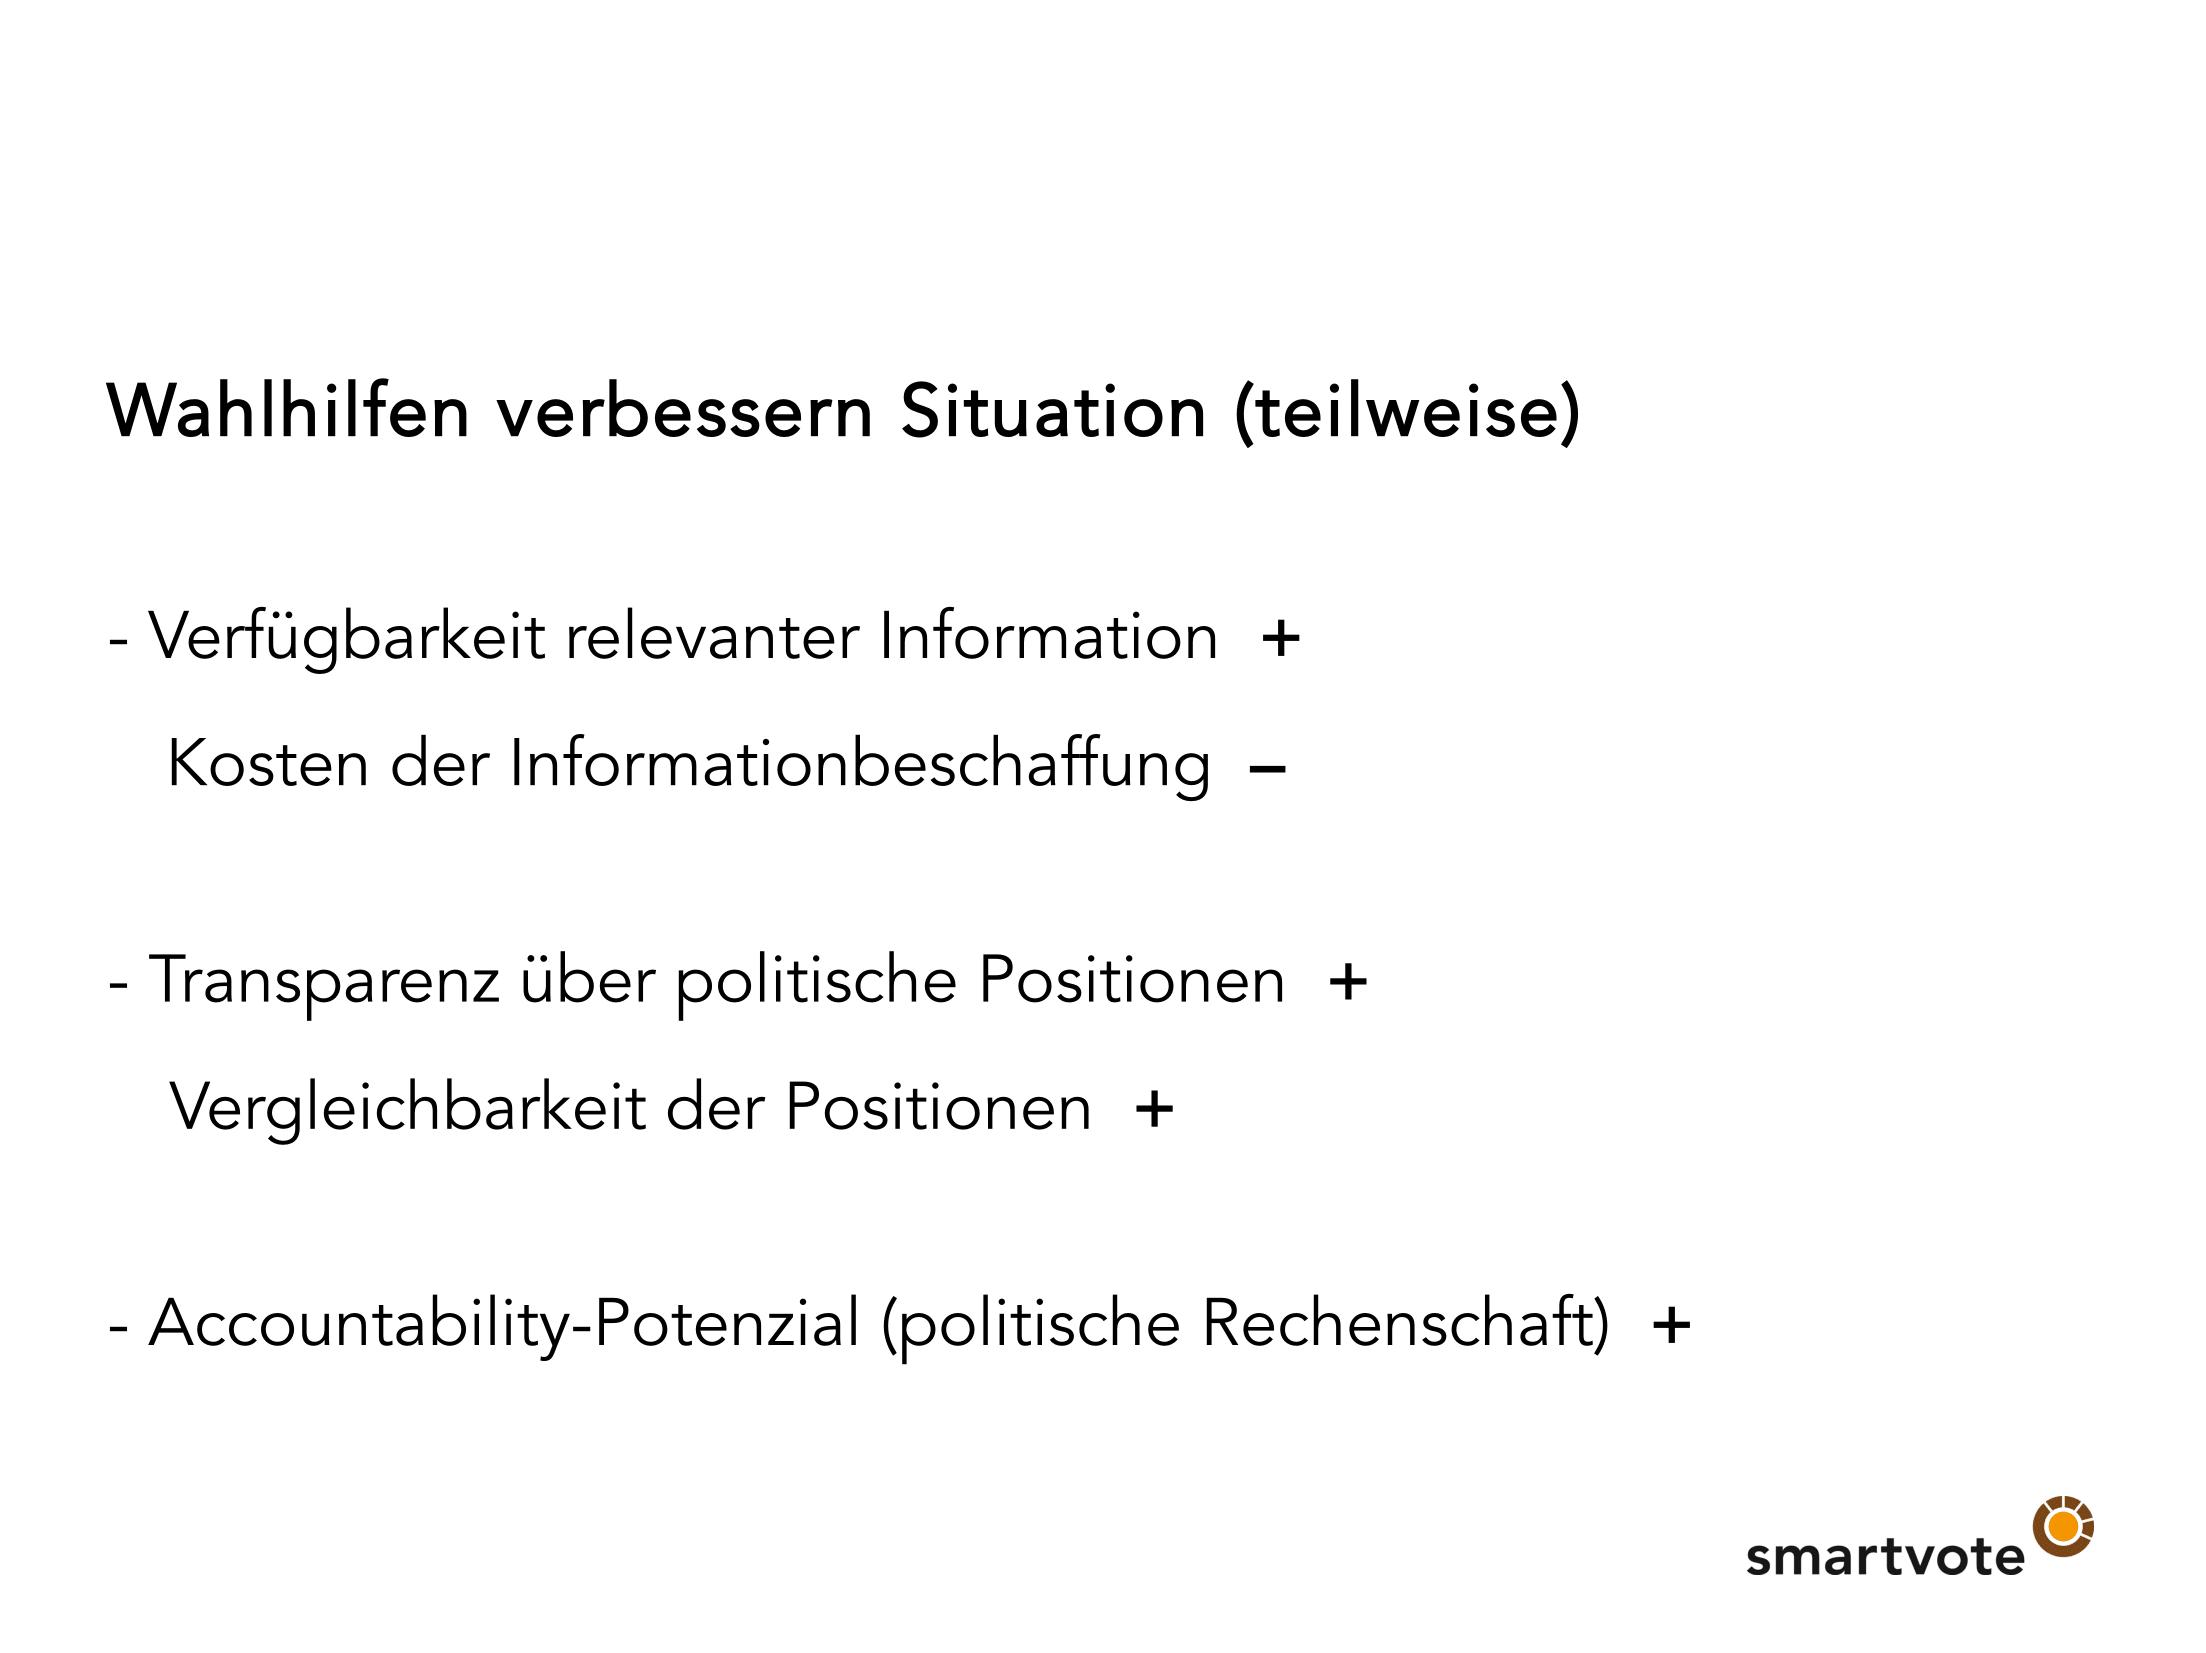 Folien Daniel Schwarz: Mehr Transparenz, stärkere Accountability, smartere Politik?